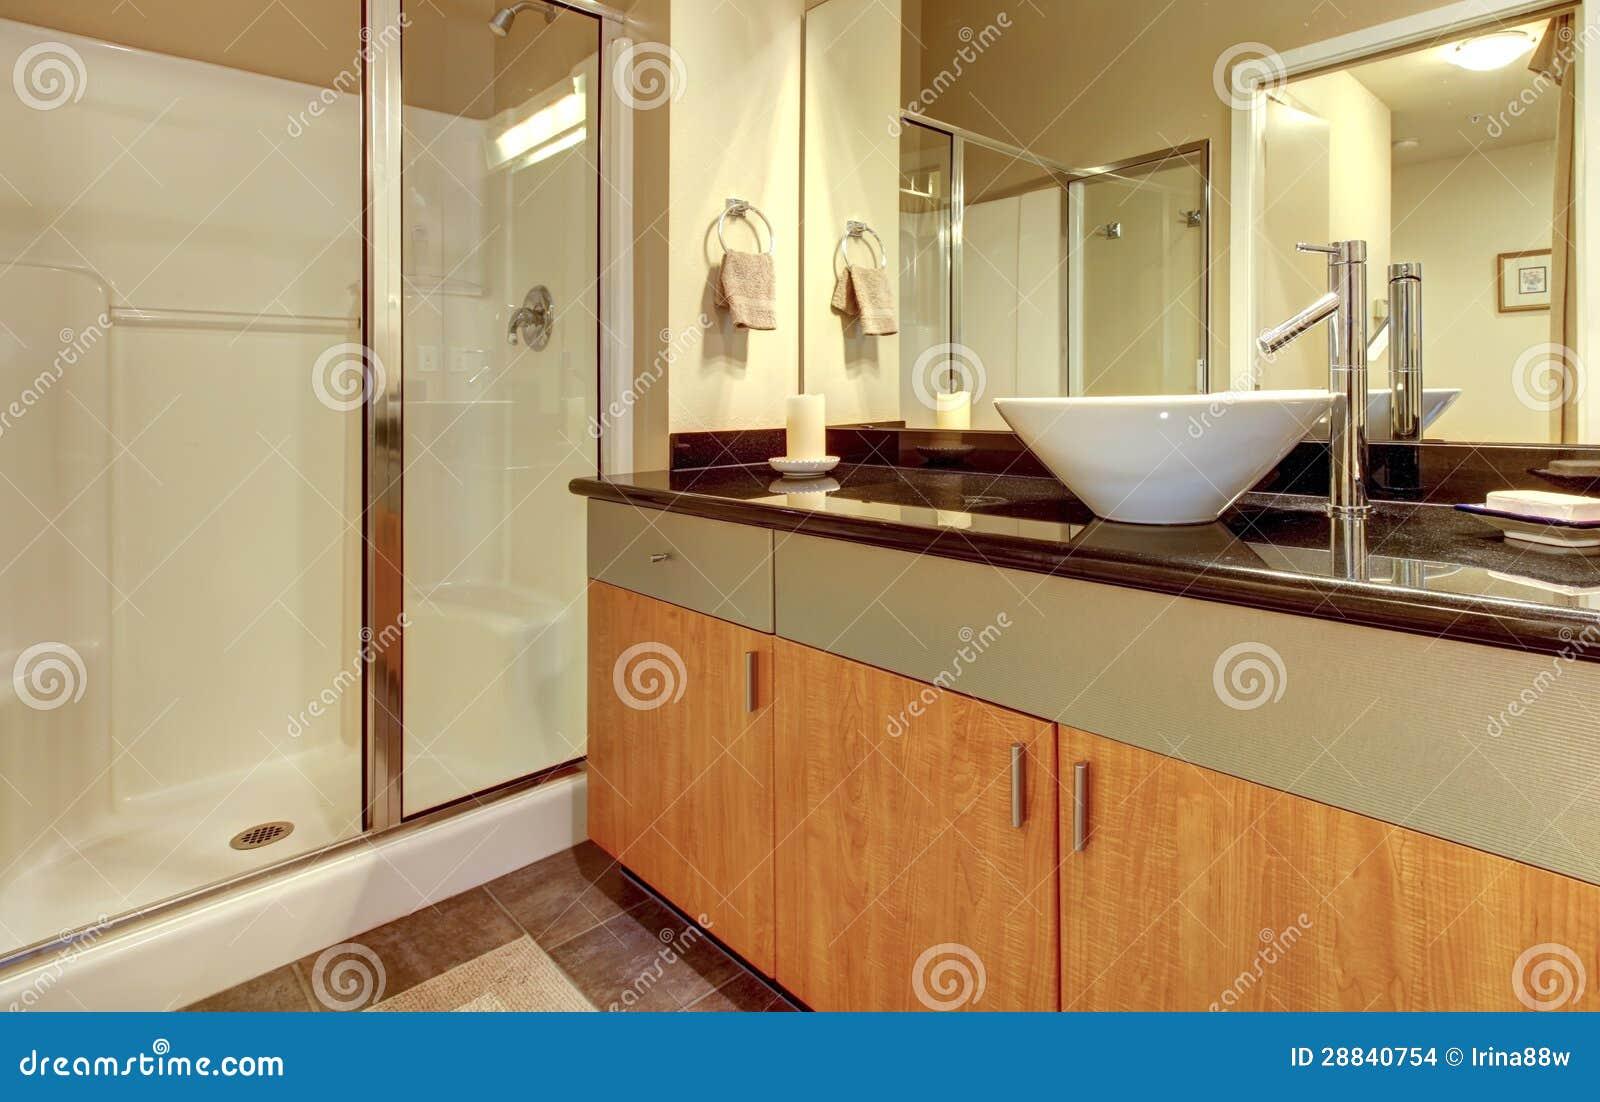 Banheiro com os gabinetes modernos de madeira o chuveiro de vidro e o  #82A229 1300 912